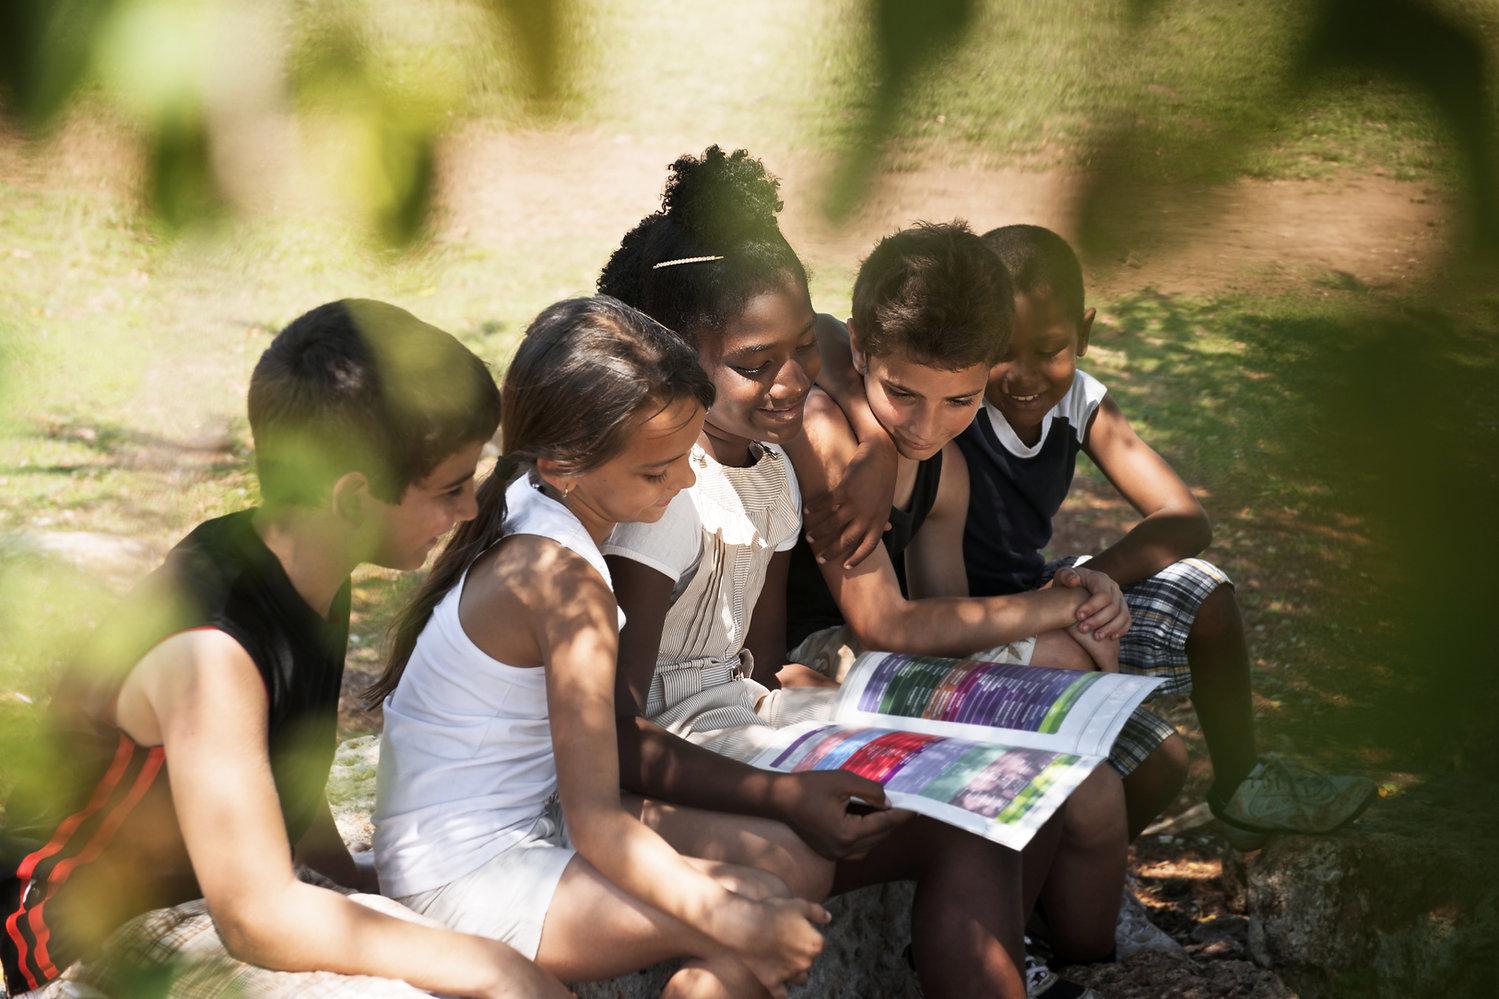 Kids Reading Book in Park